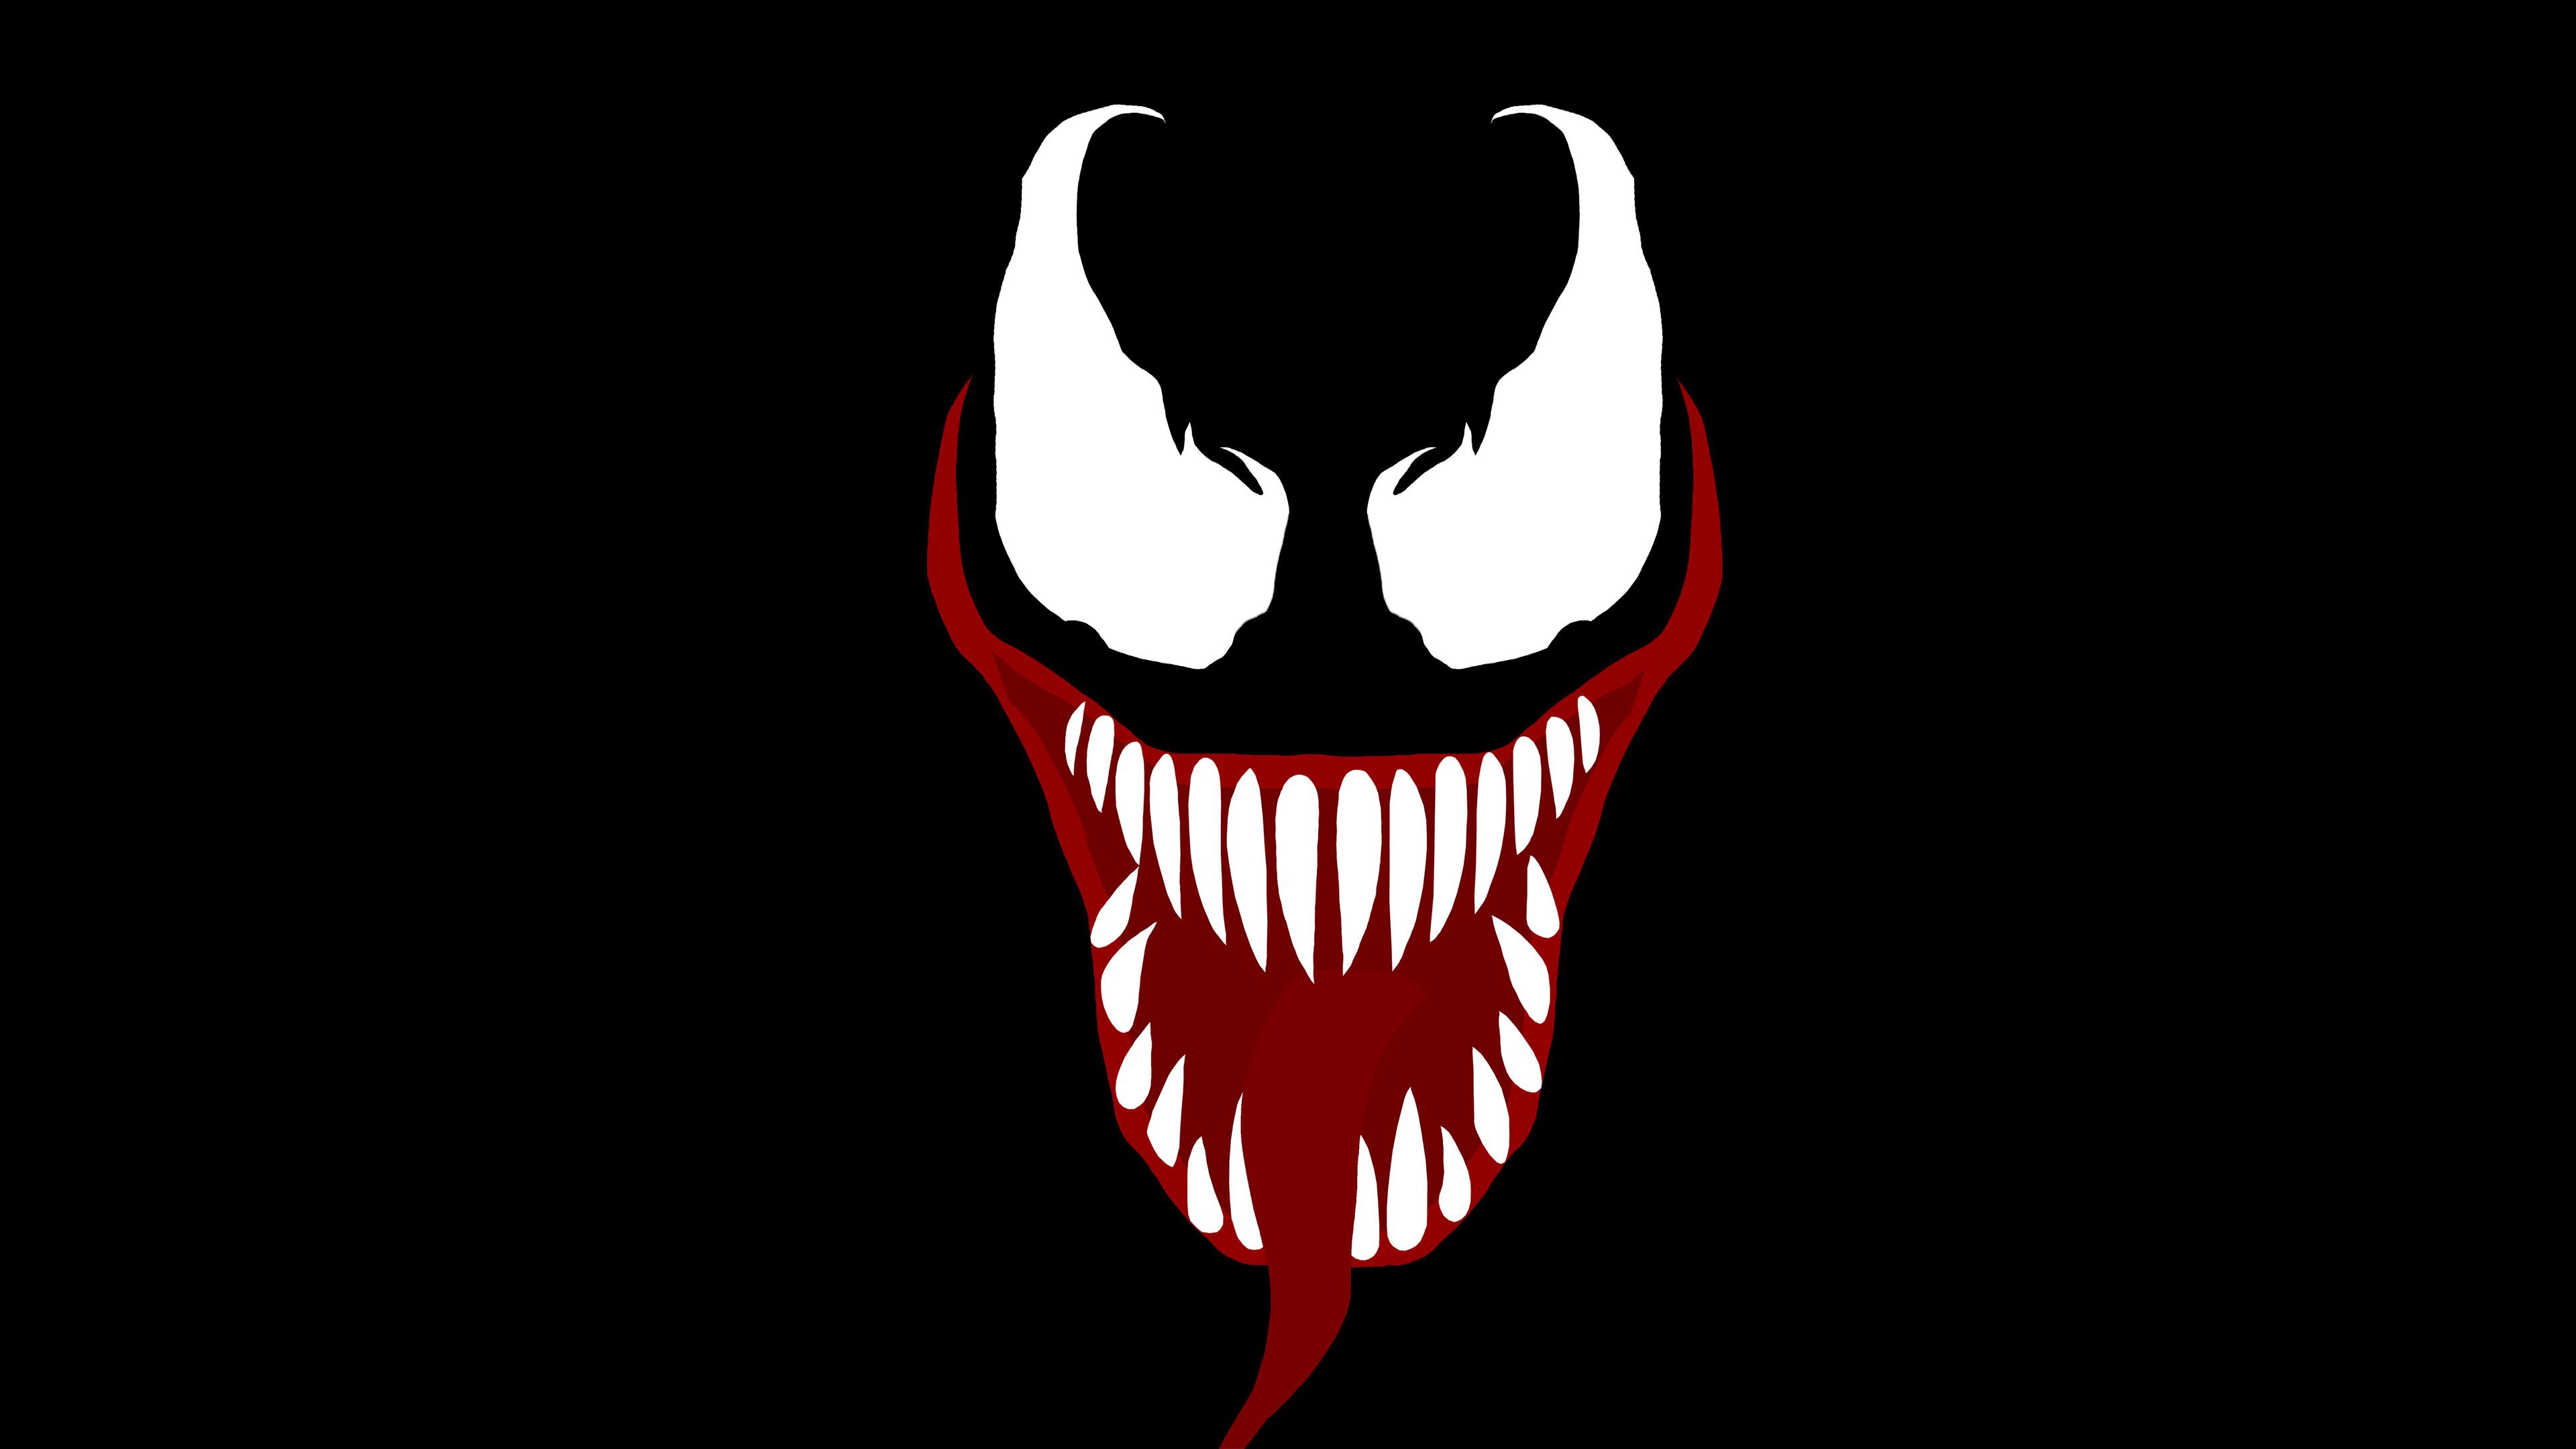 2048x2048 Venom 2018 Movie 4k Ipad Air Hd 4k Wallpapers: Venom Movie Face Venom Wallpapers, Venom Movie Wallpapers